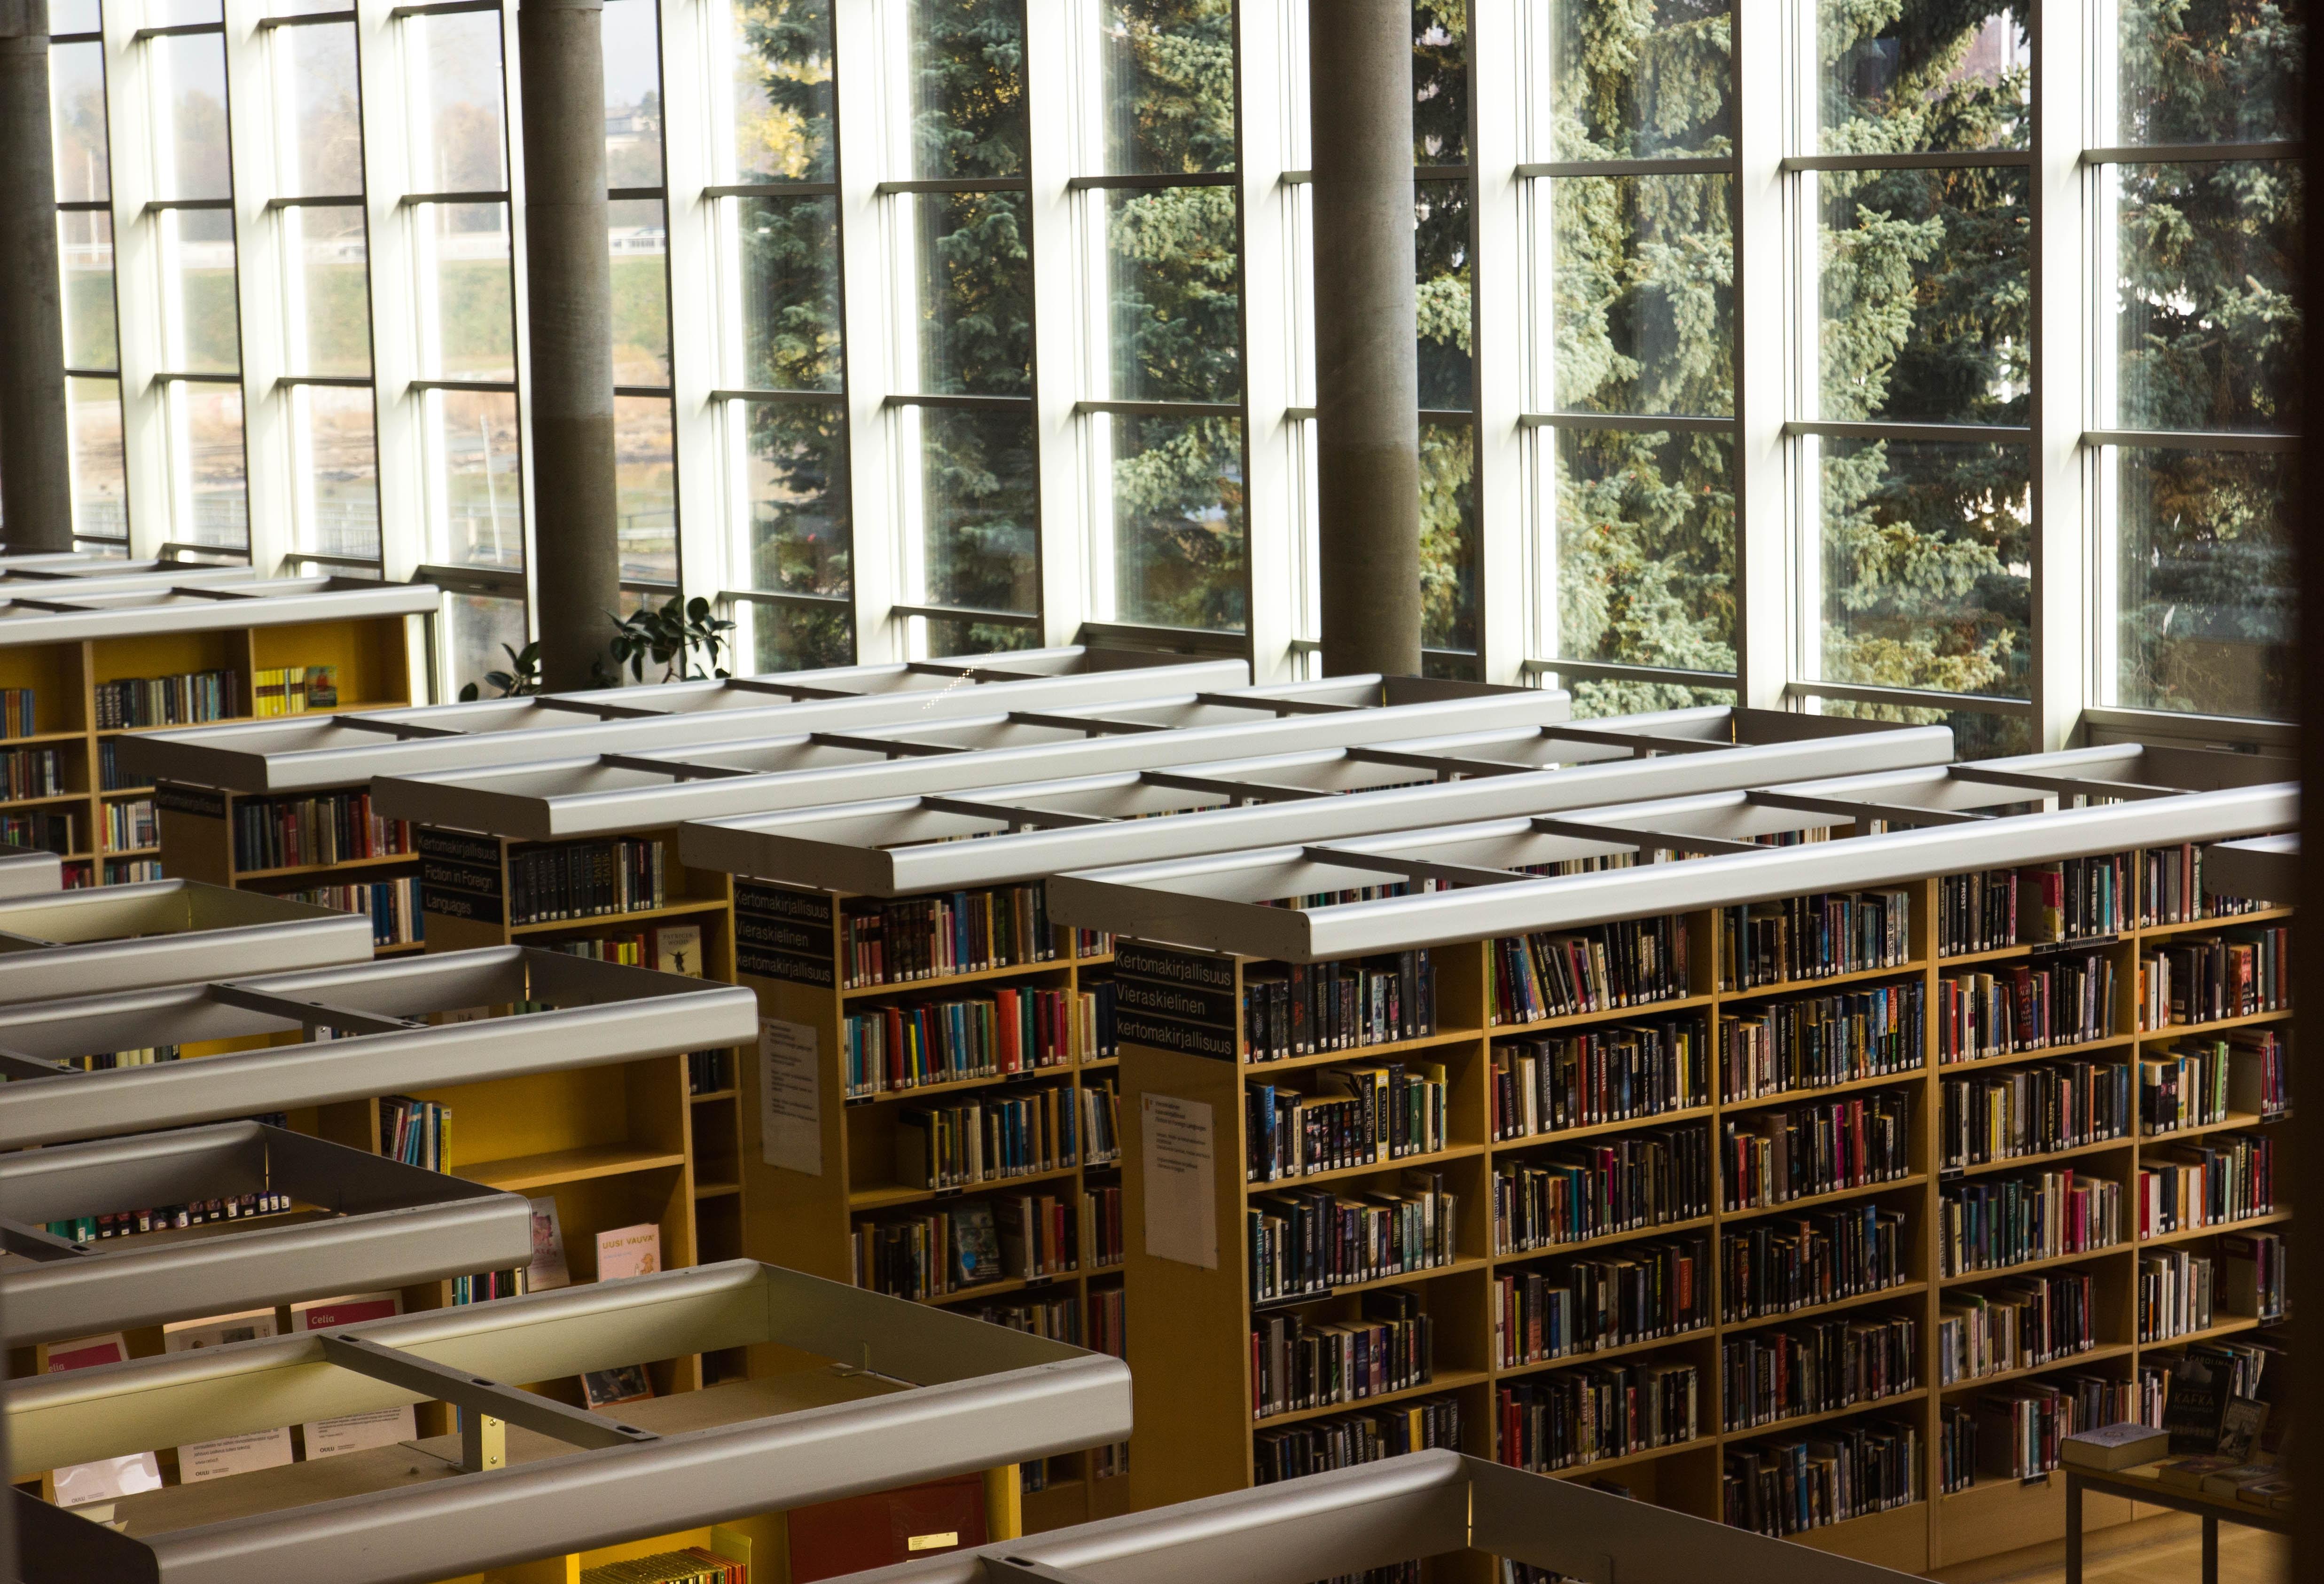 brown wooden bookshelves during daytime